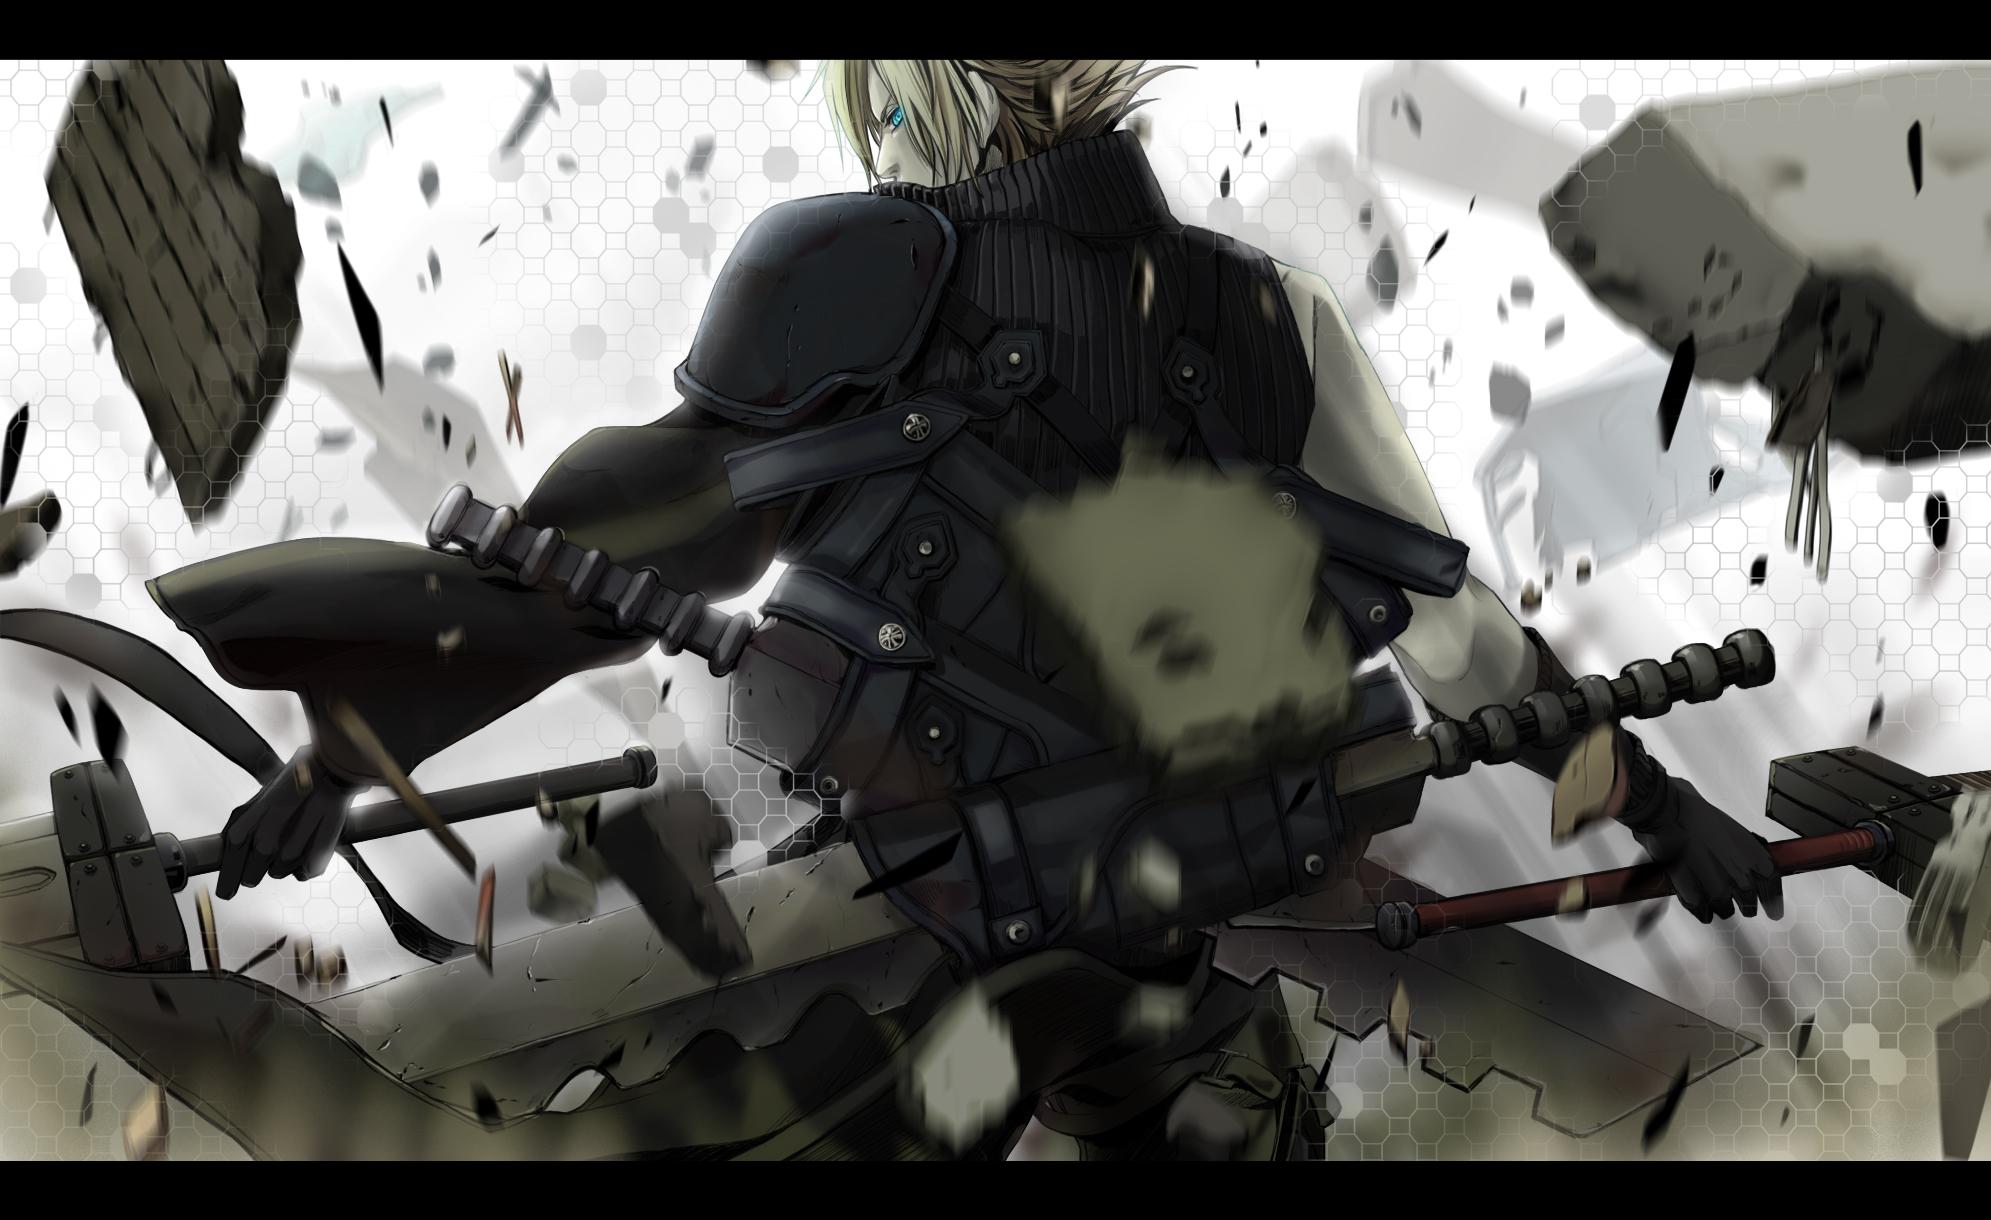 blonde_hair blue_eyes cloud_strife final_fantasy final_fantasy_vii final_fantasy_vii_advent_children short_hair sword weapon